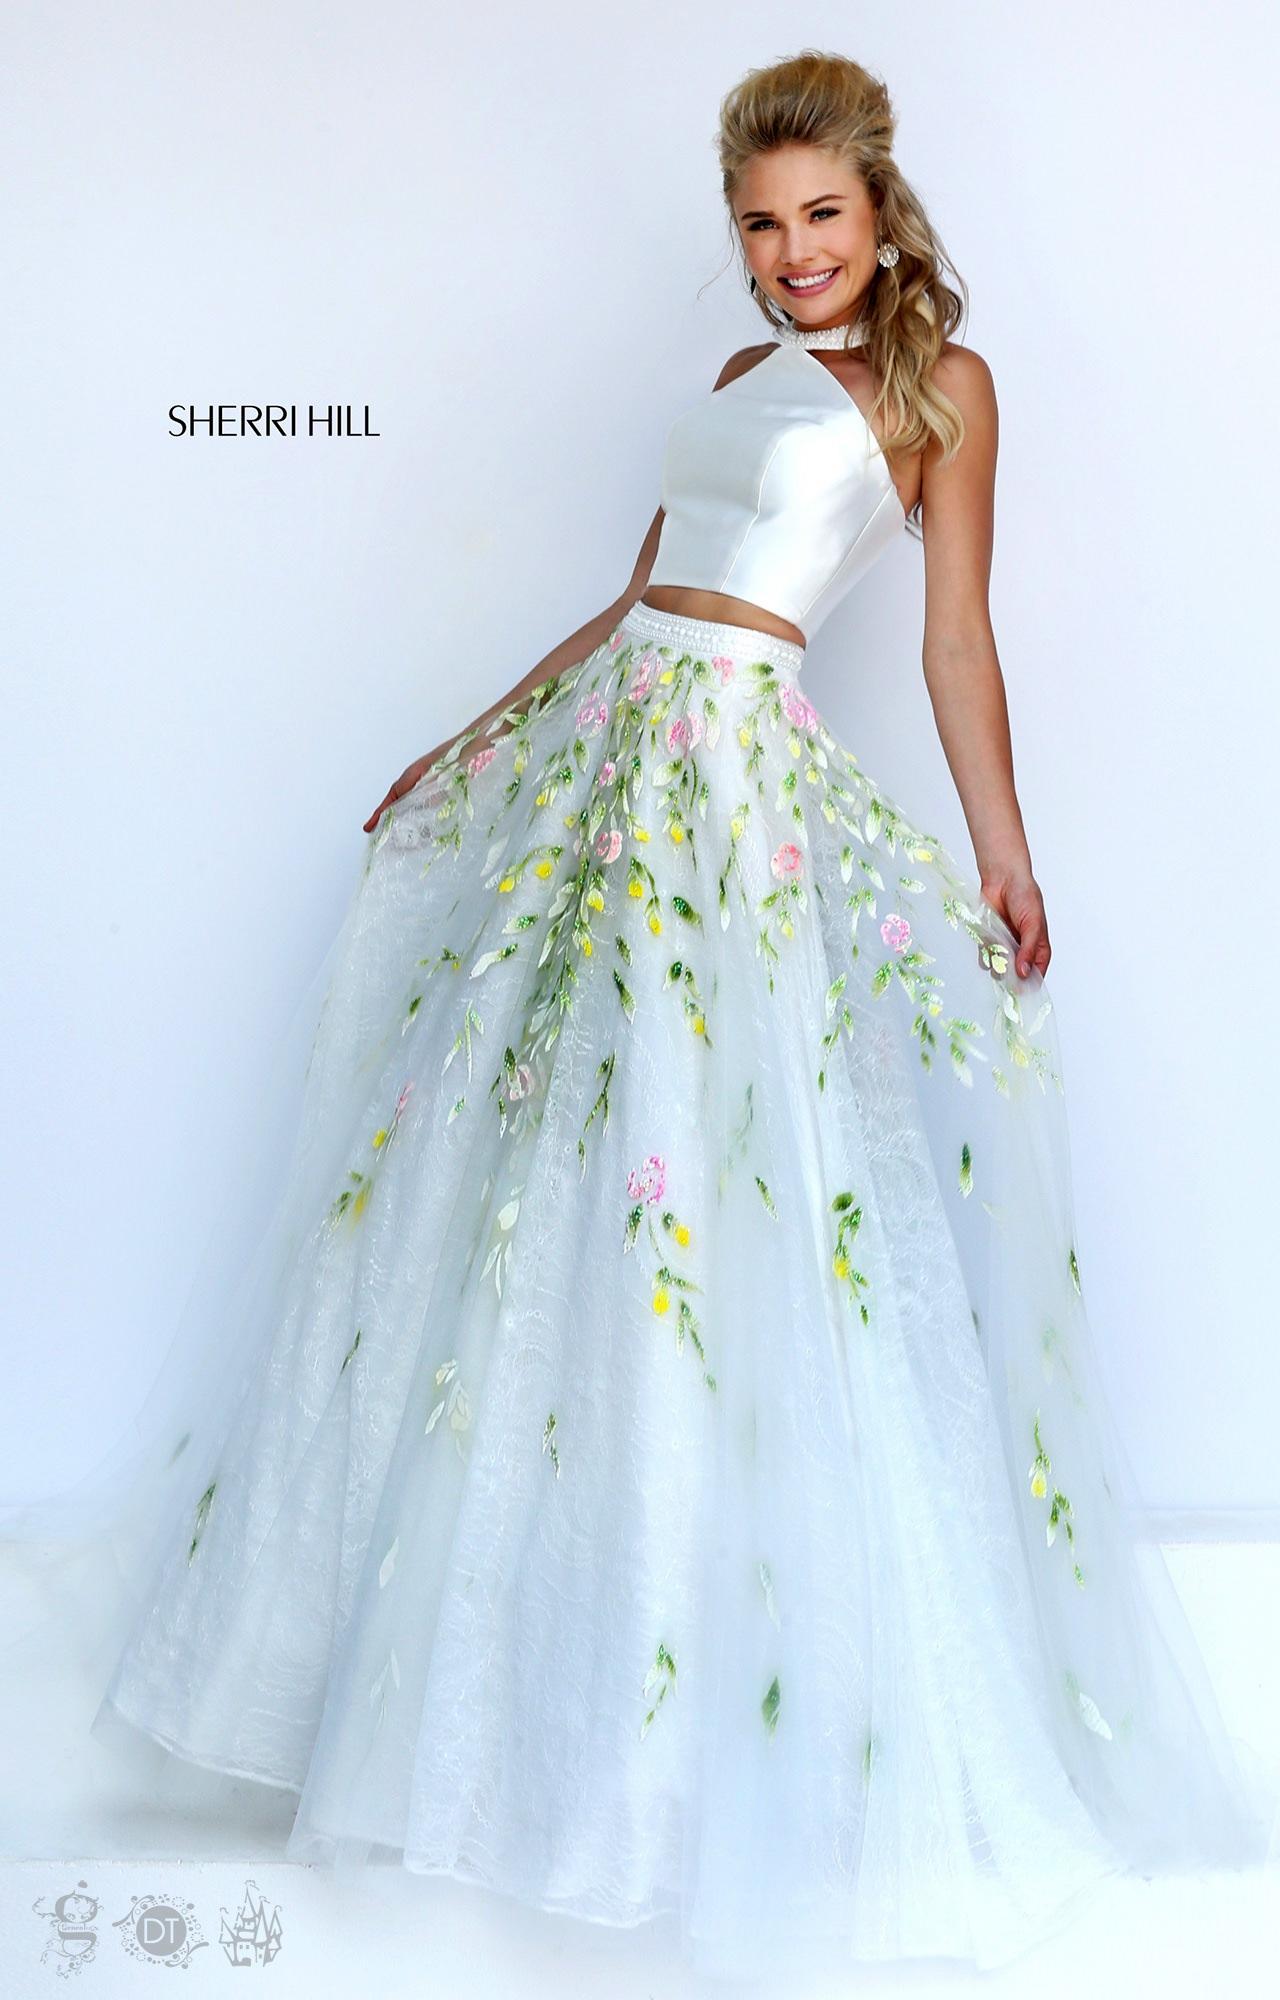 Sherri Hill 50196 - The Garden Party Dress Prom Dress